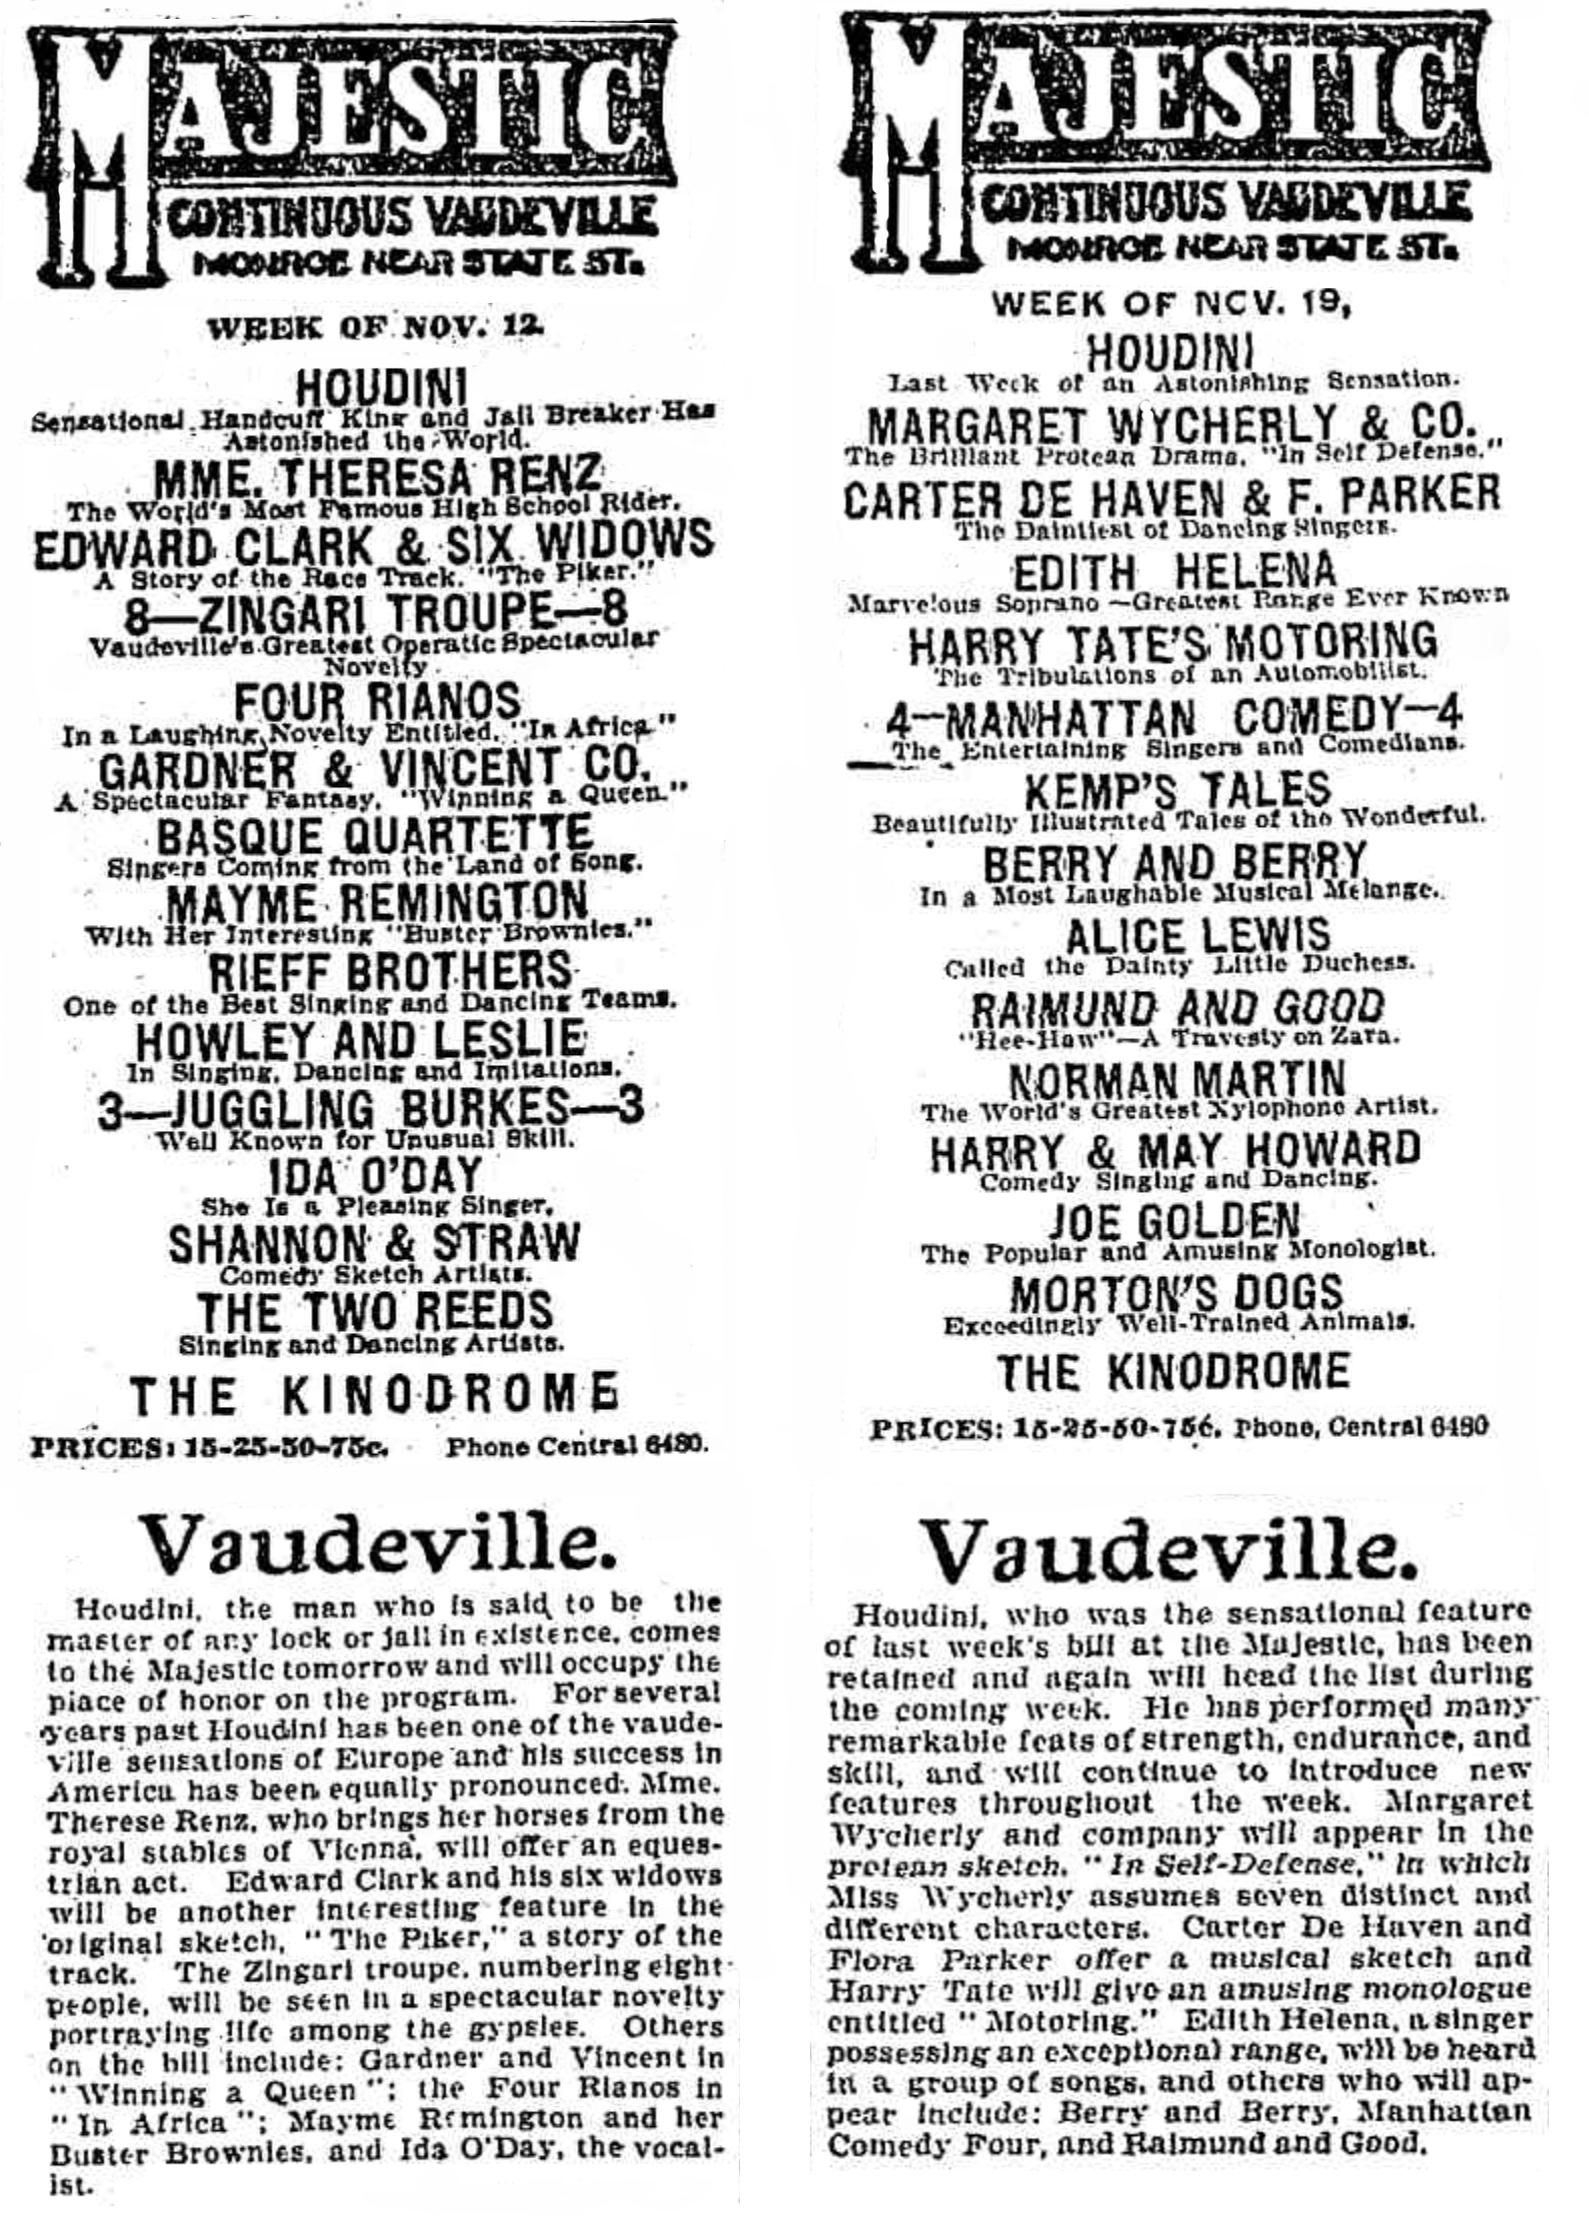 Chicago Sunday Tribune, November 11, 1906